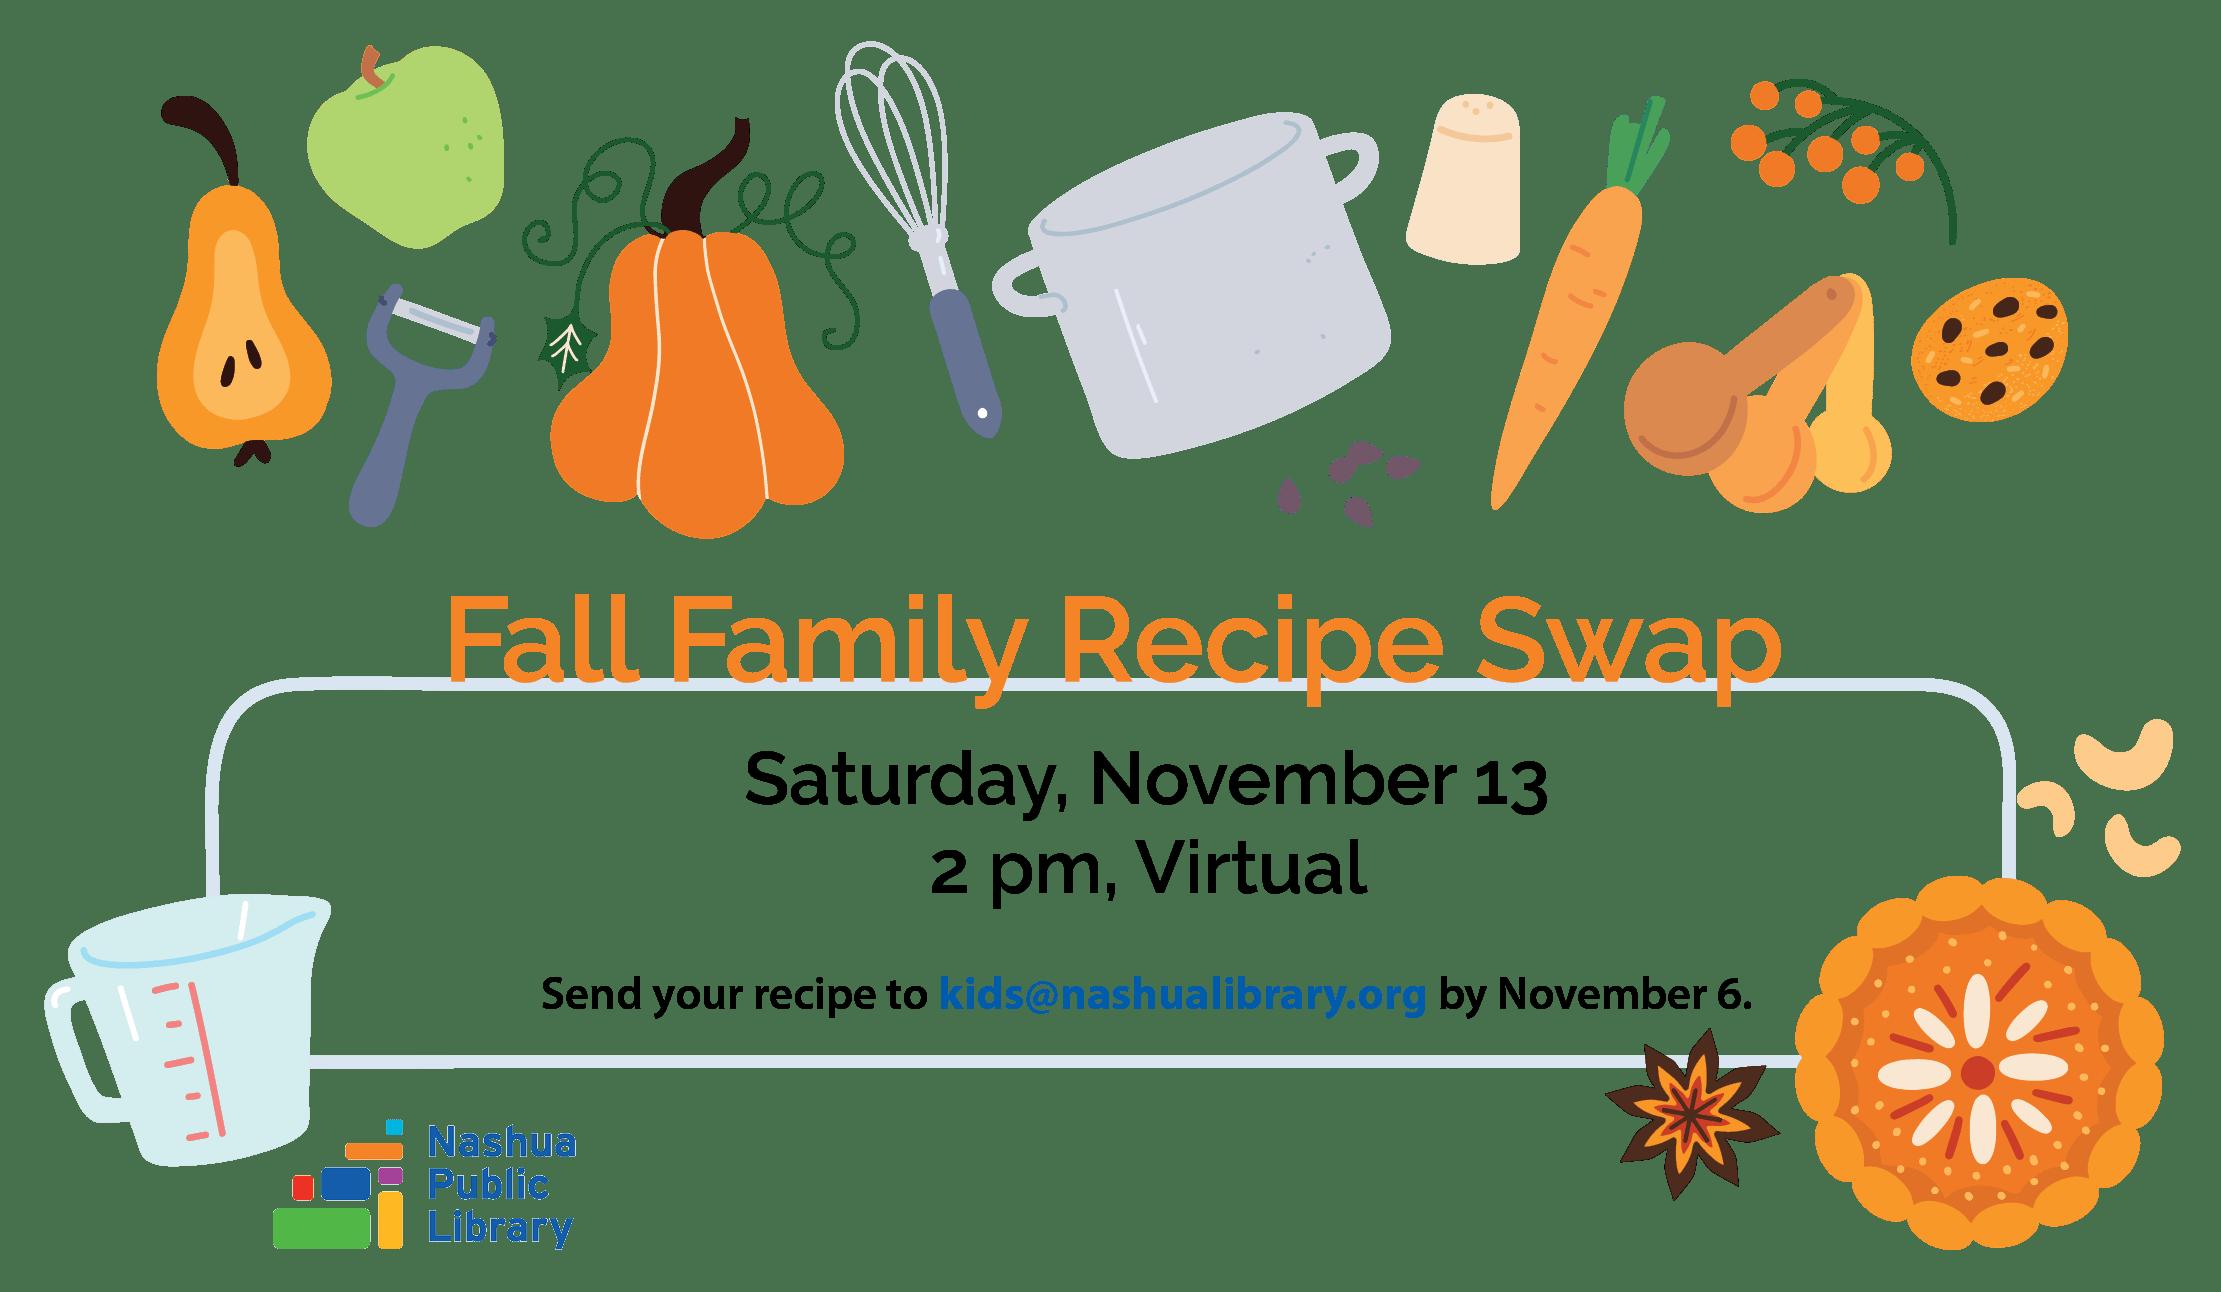 Fall family recipe swap, saturday, November 13 at 2 pm, Virtual. Send your recipe to kids@nashualibrary.org by November 6